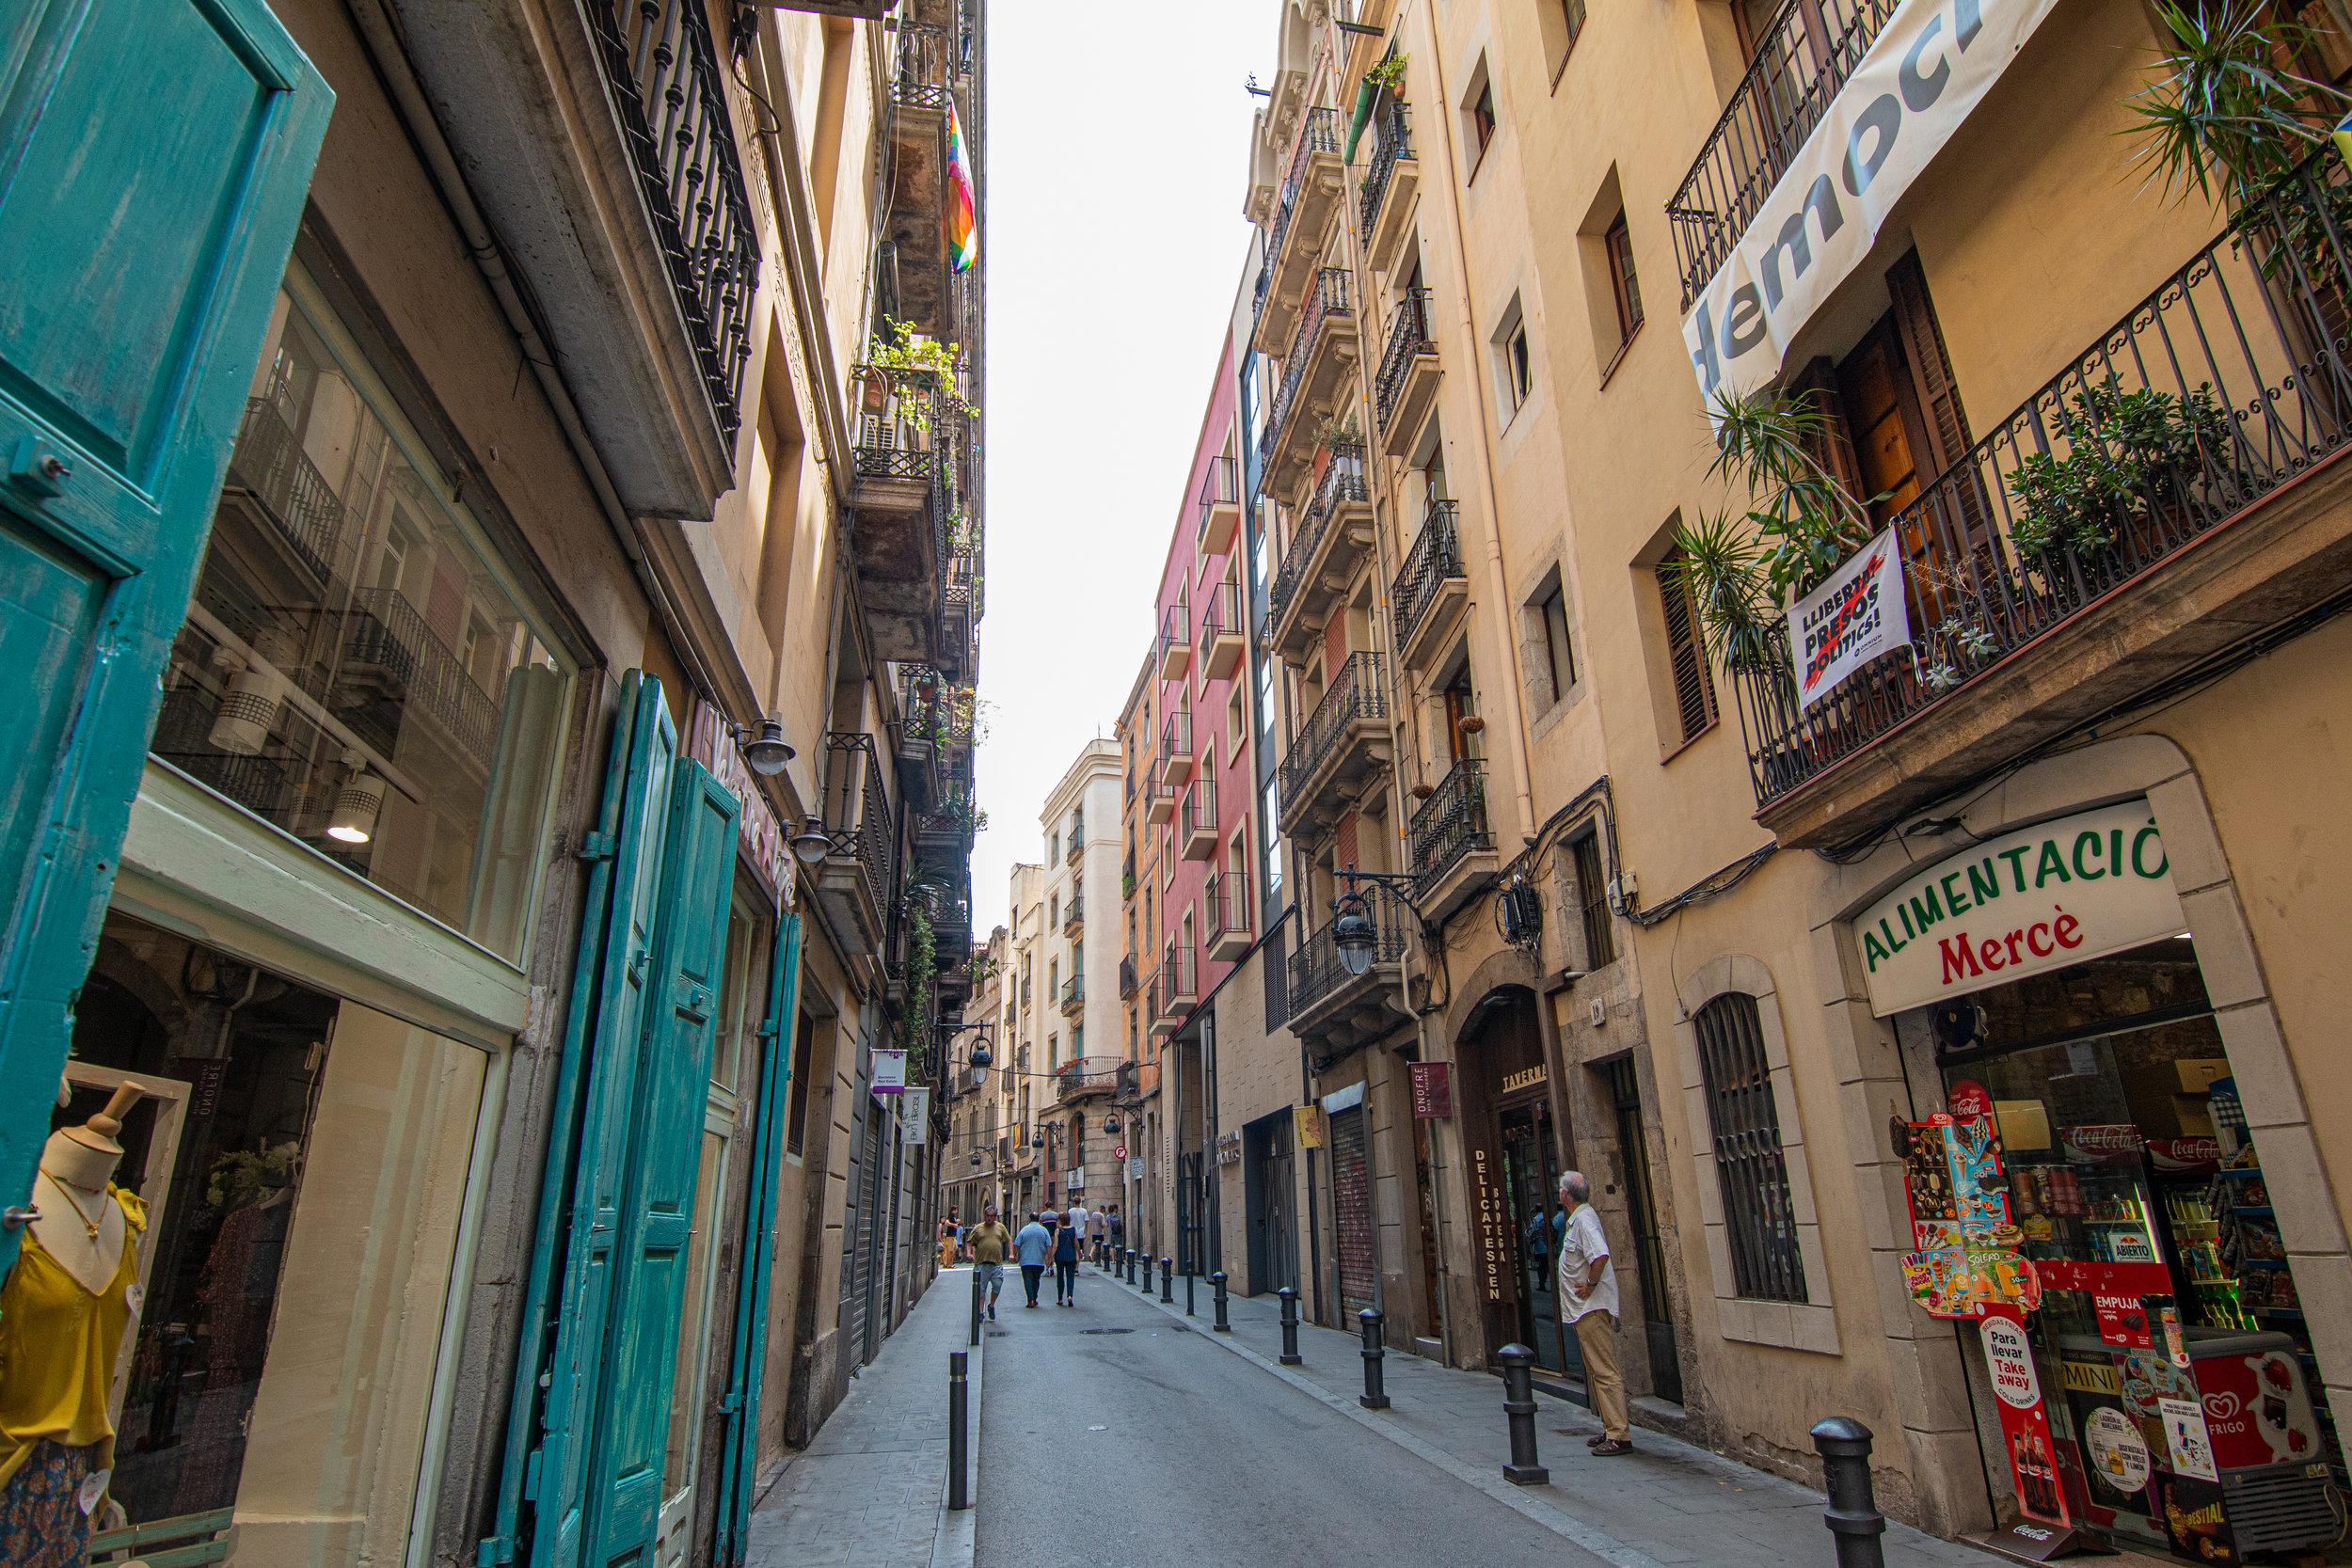 Barcelona-Gotico-1.jpg